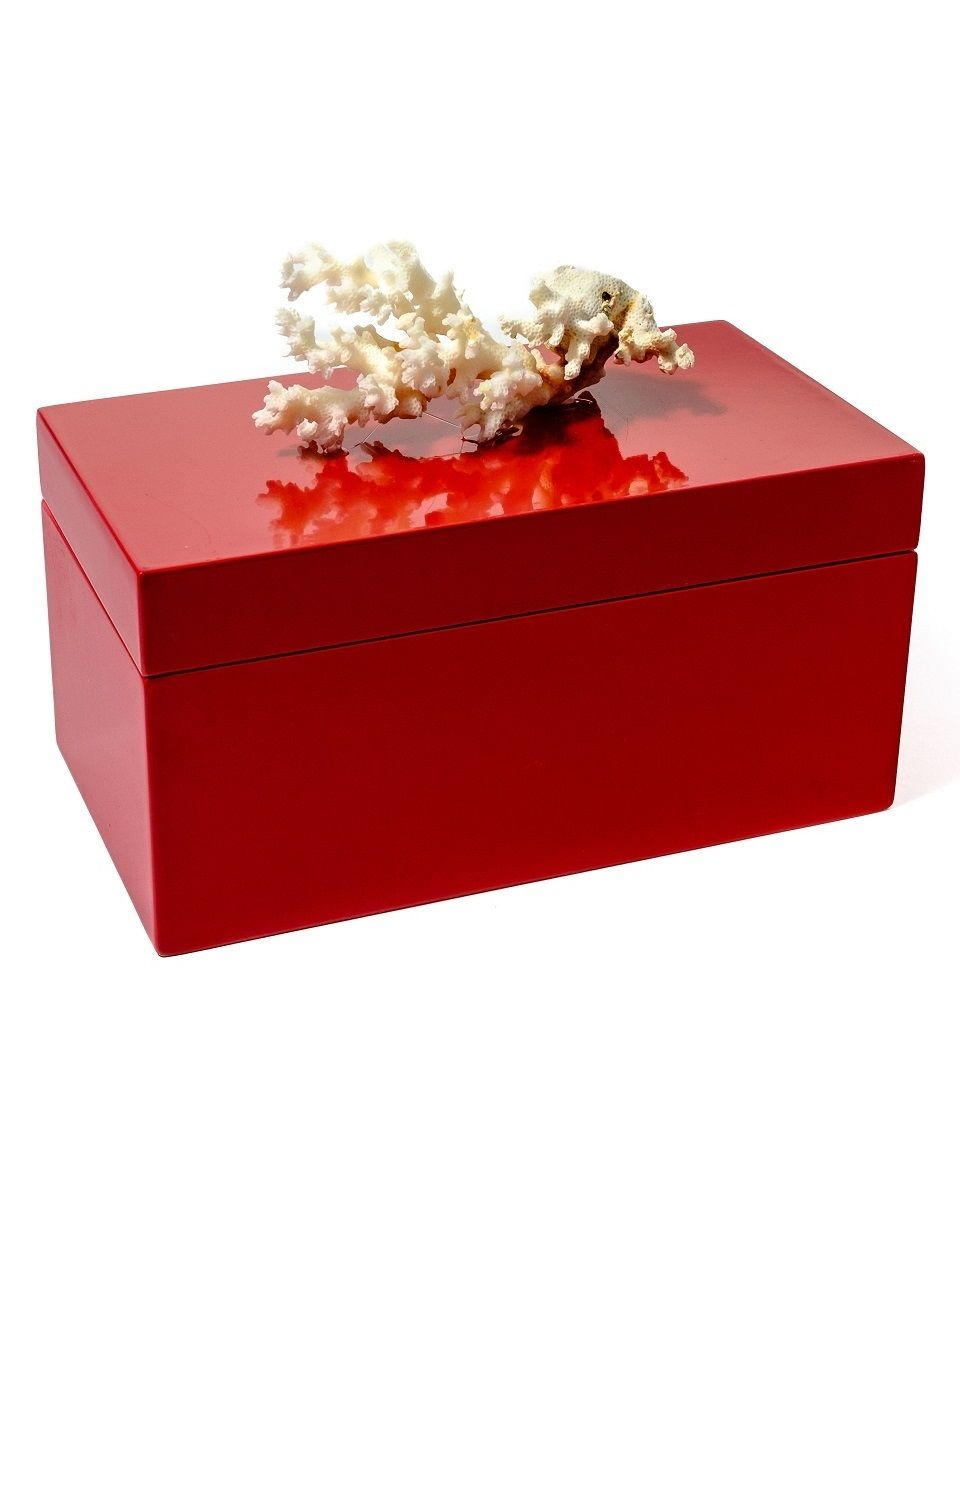 Red Gift Box Red Gift Boxes Red Gift Box With Lid Red Wood Box Red Gift Box Online Desk Box Desk Boxes Gift Box Gift Boxes Stationery Box St